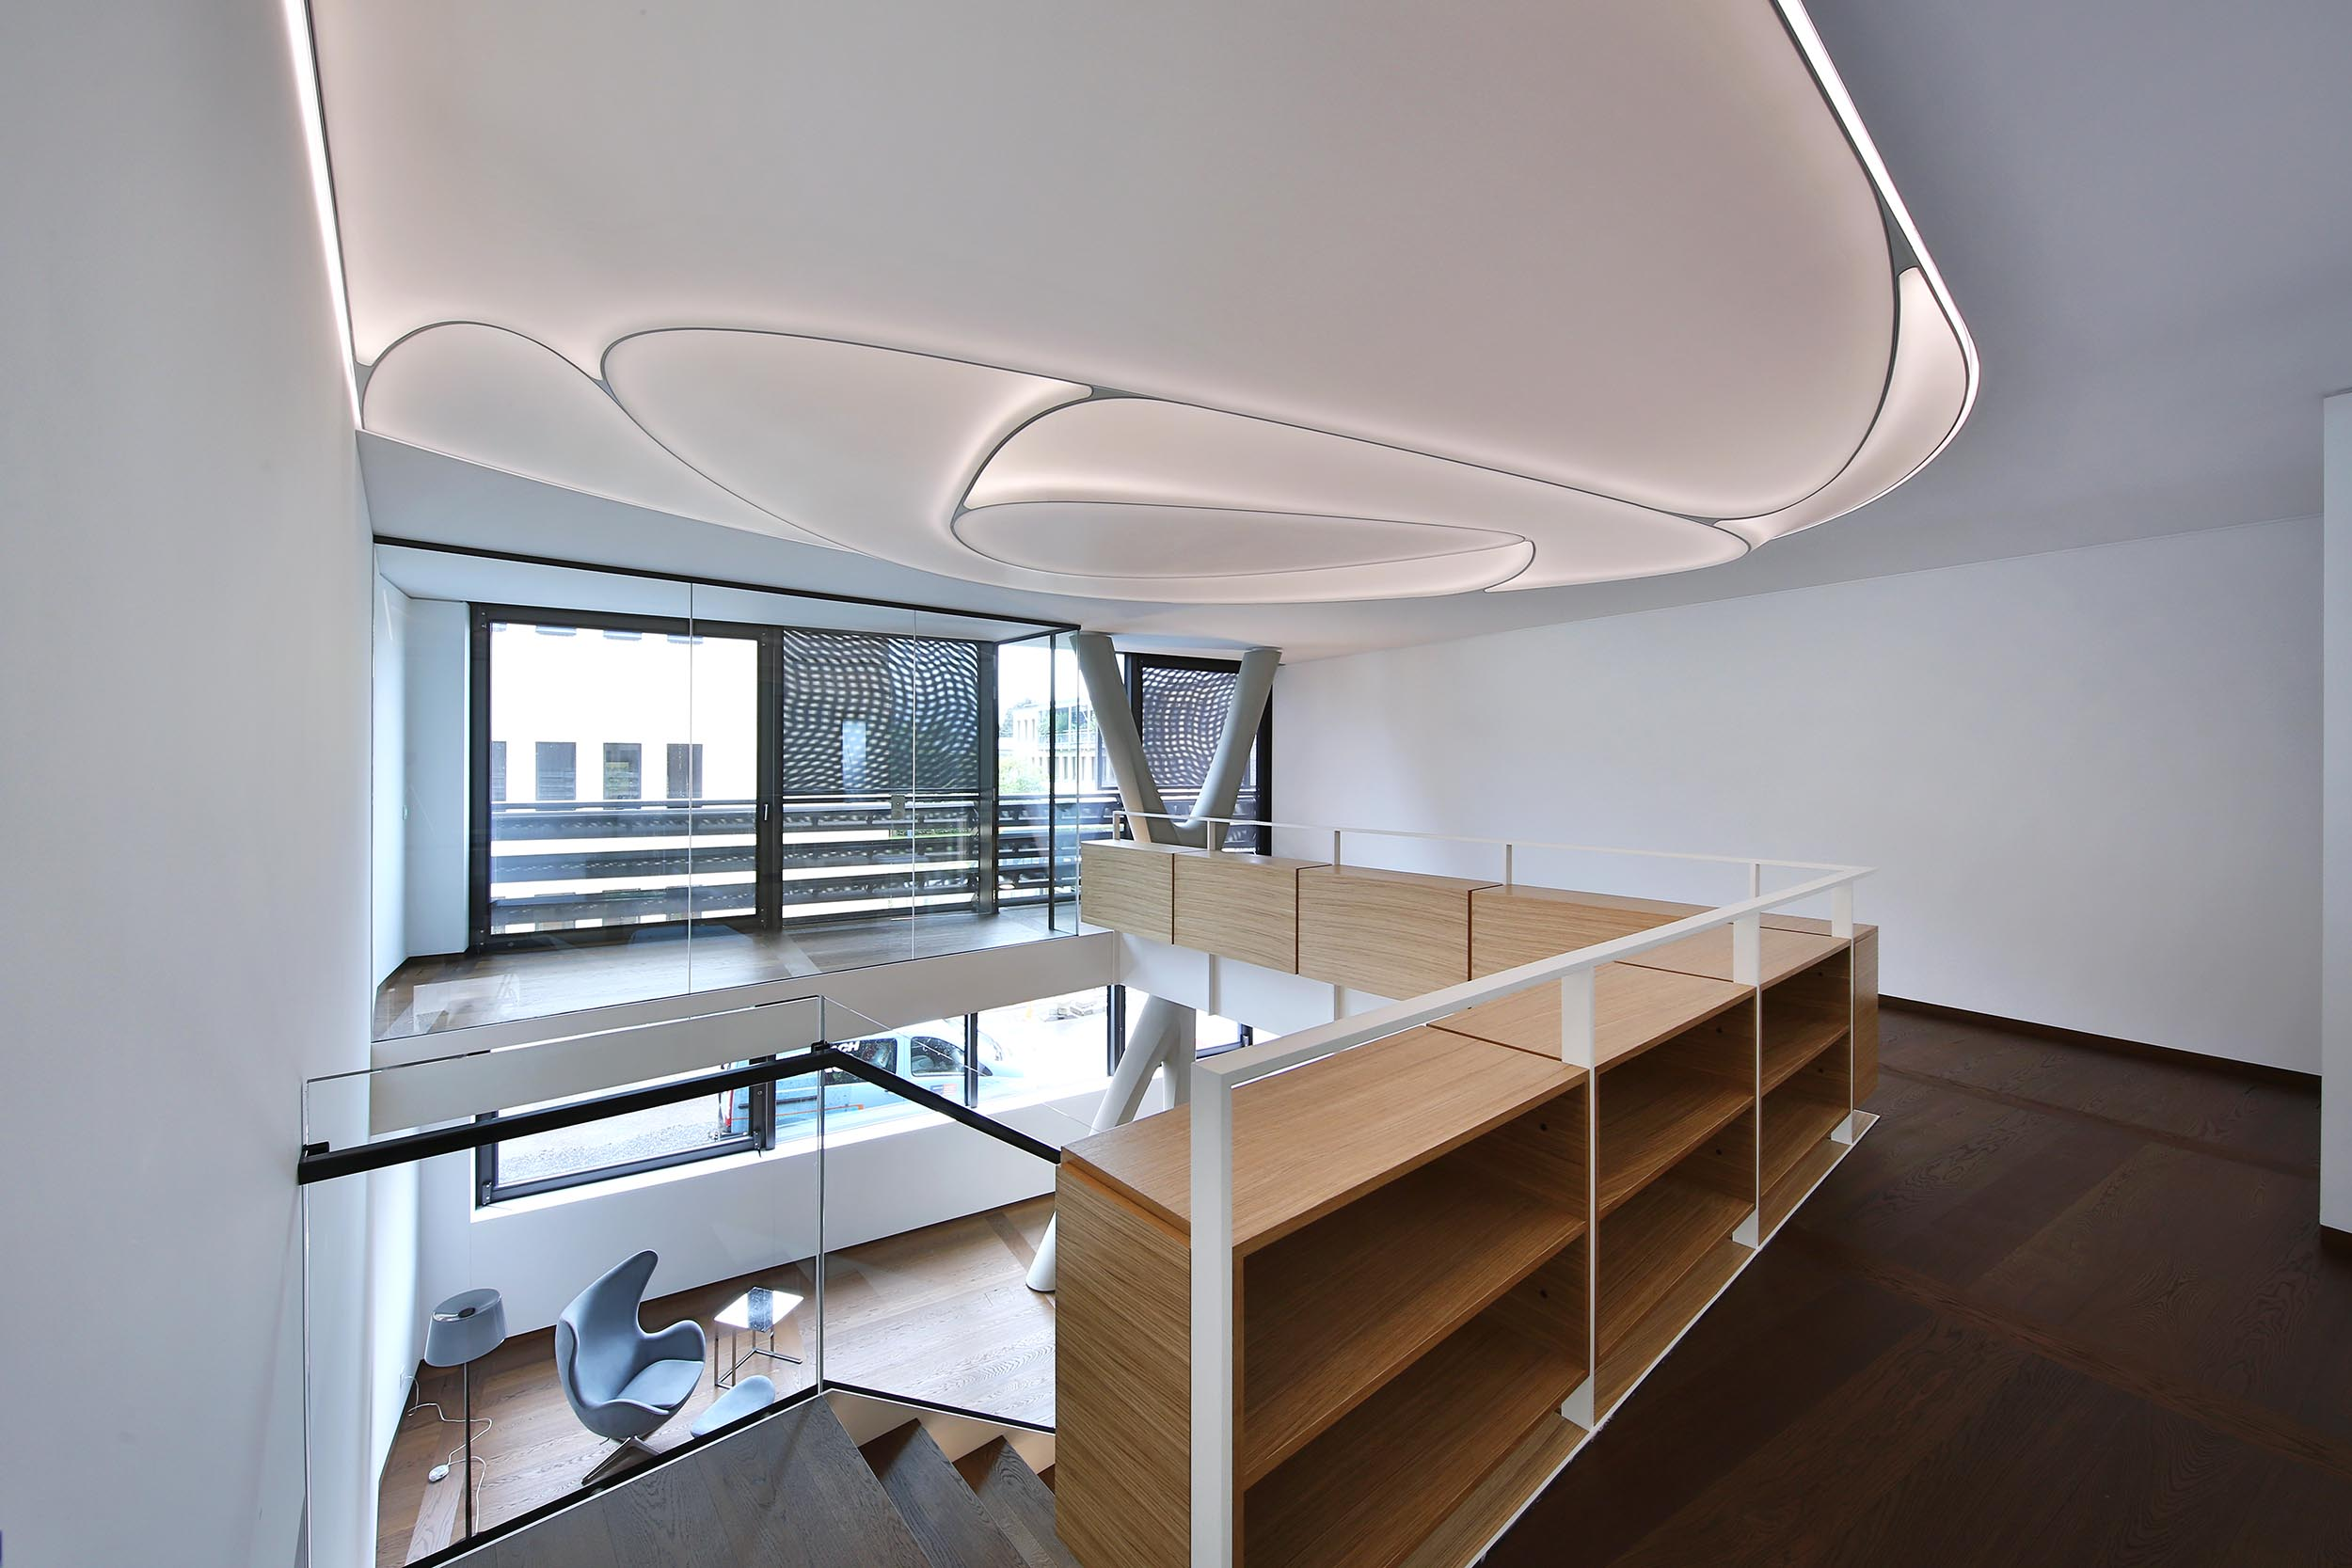 P14_falkeis.architects_a.e.b_Foto R. Korner.jpg